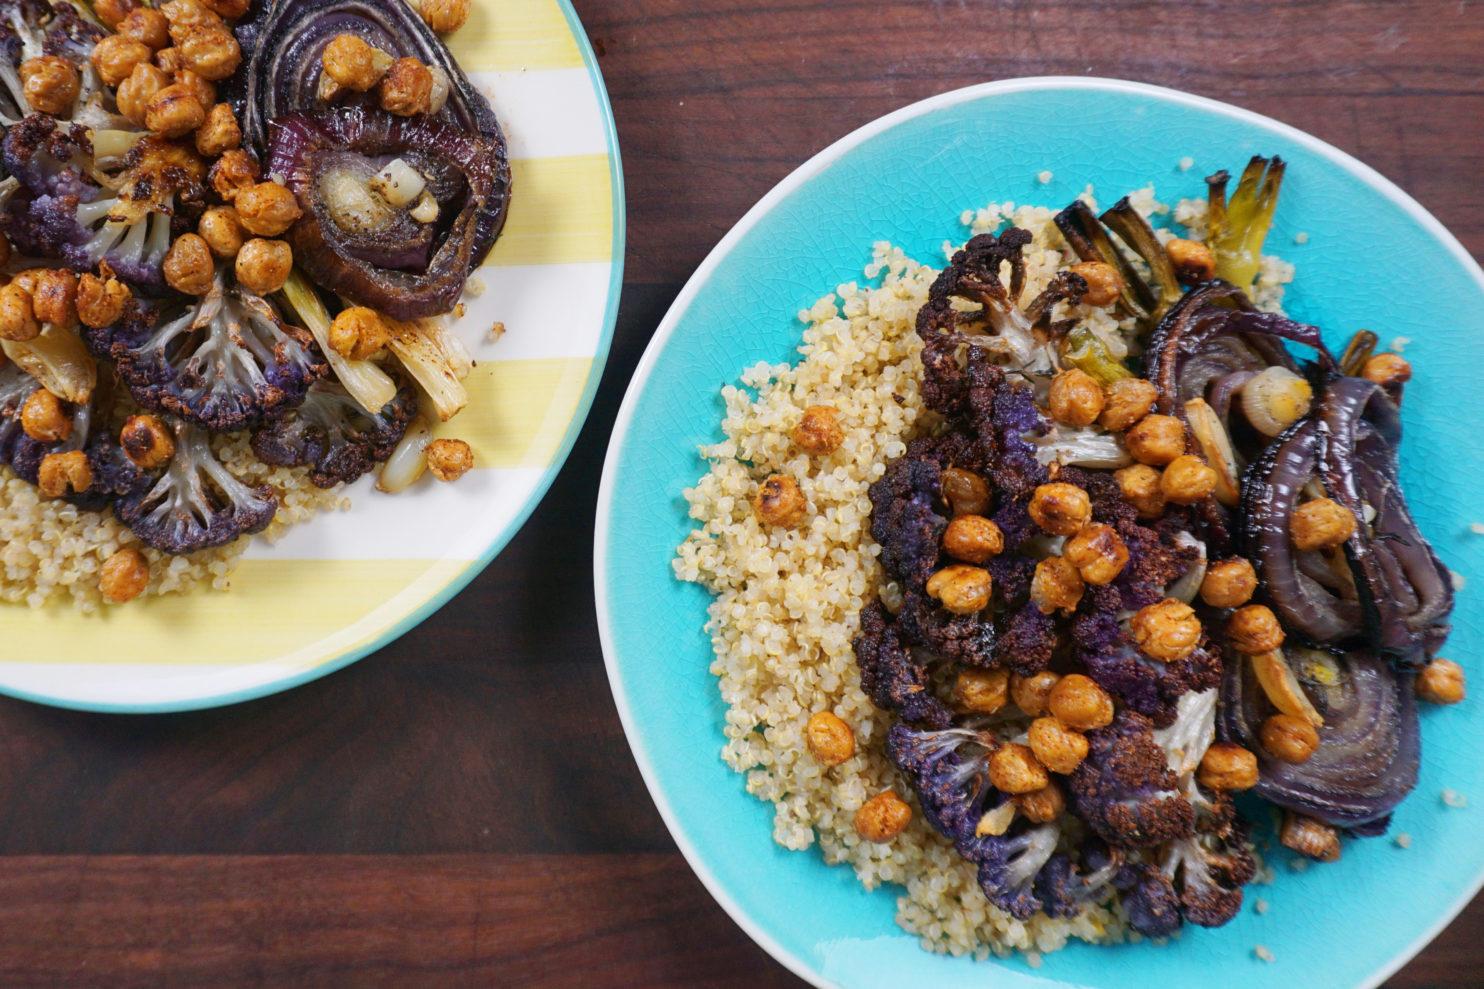 Roasted Purple Cauliflower with Crunchy Chickpeas & Quinoa